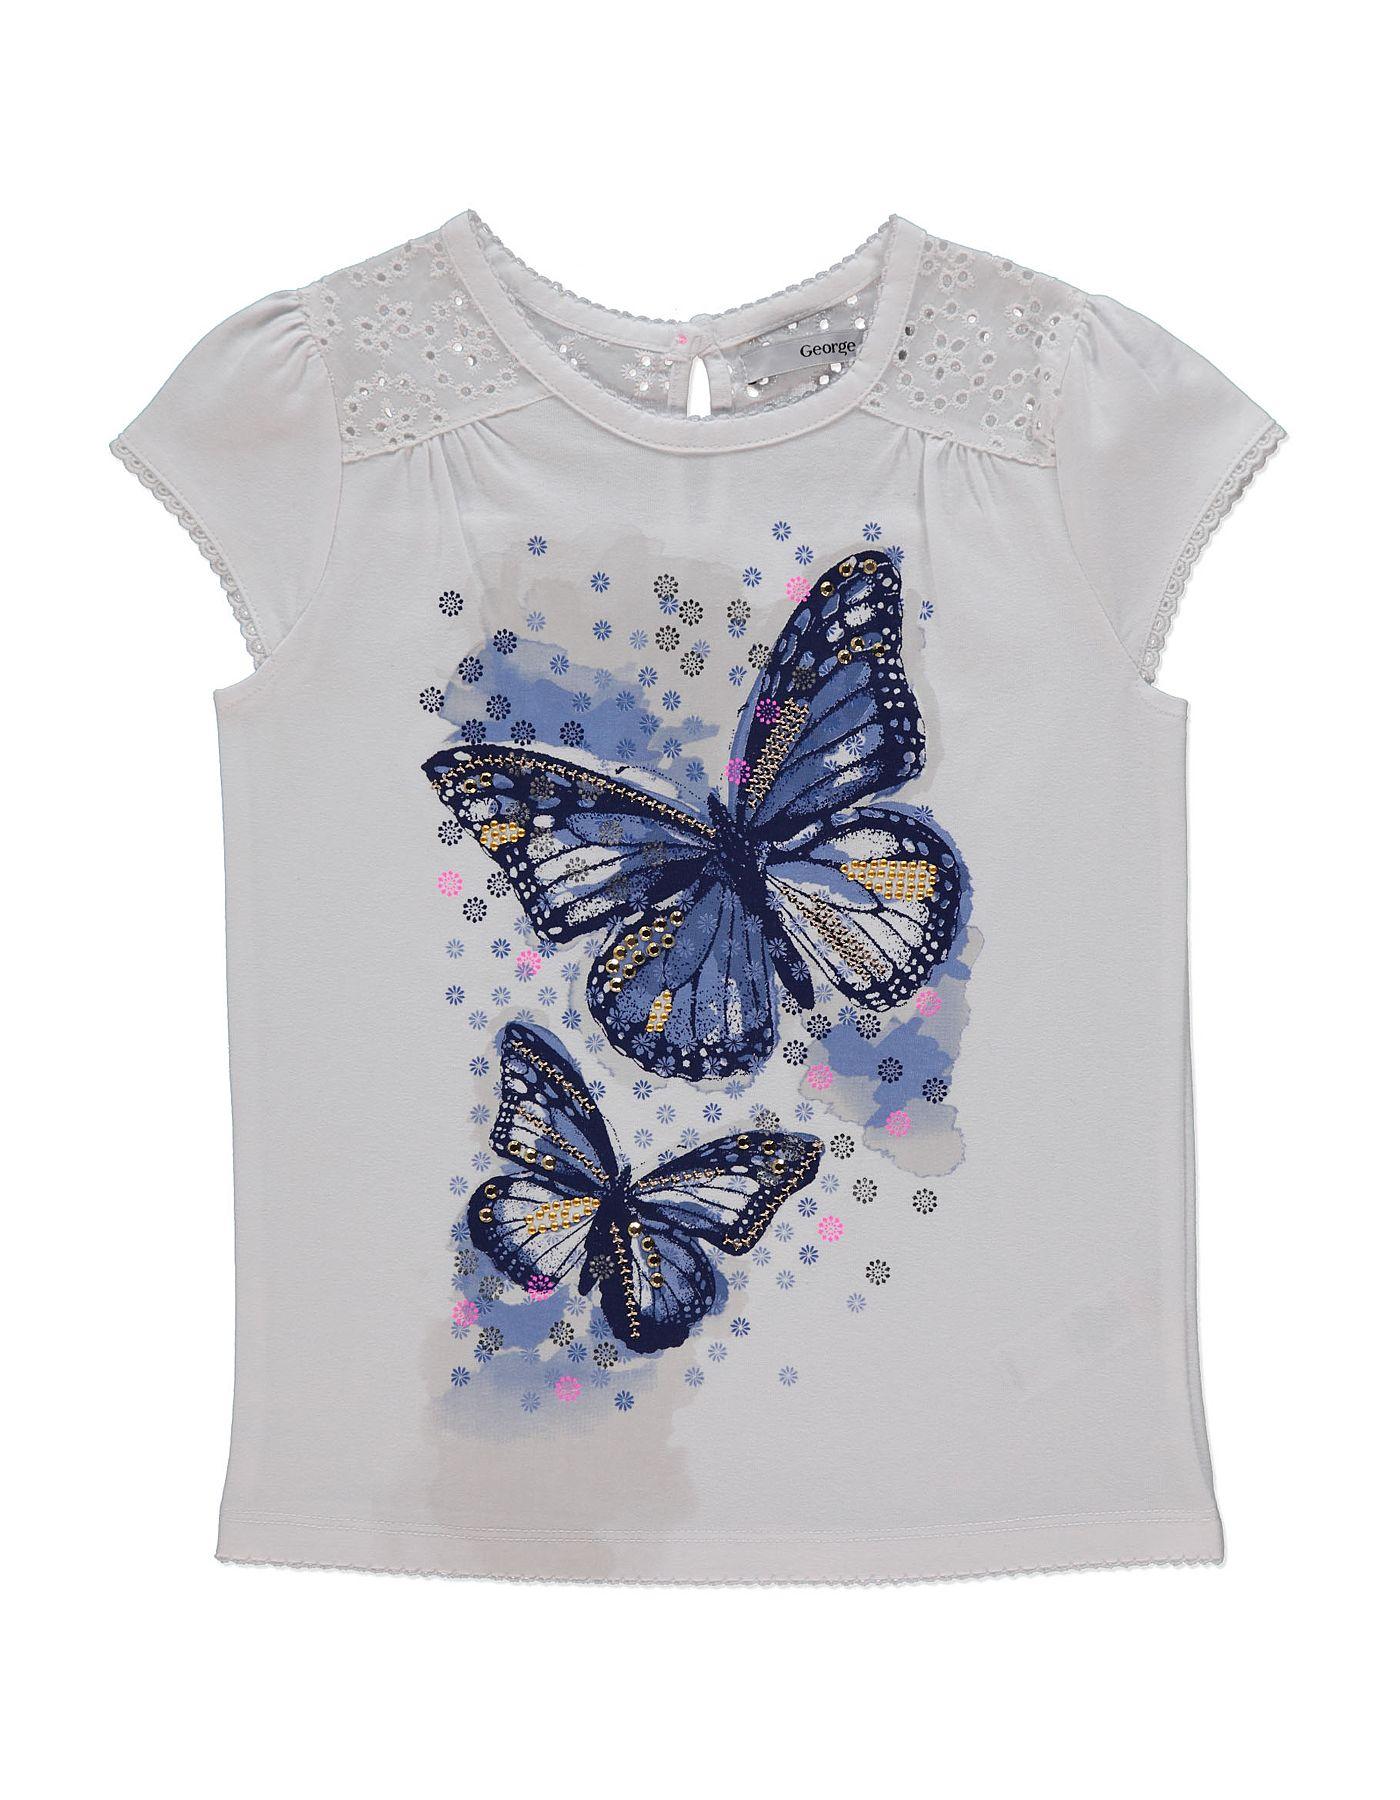 Black t shirt asda - Butterfly Print T Shirt Kids George At Asda